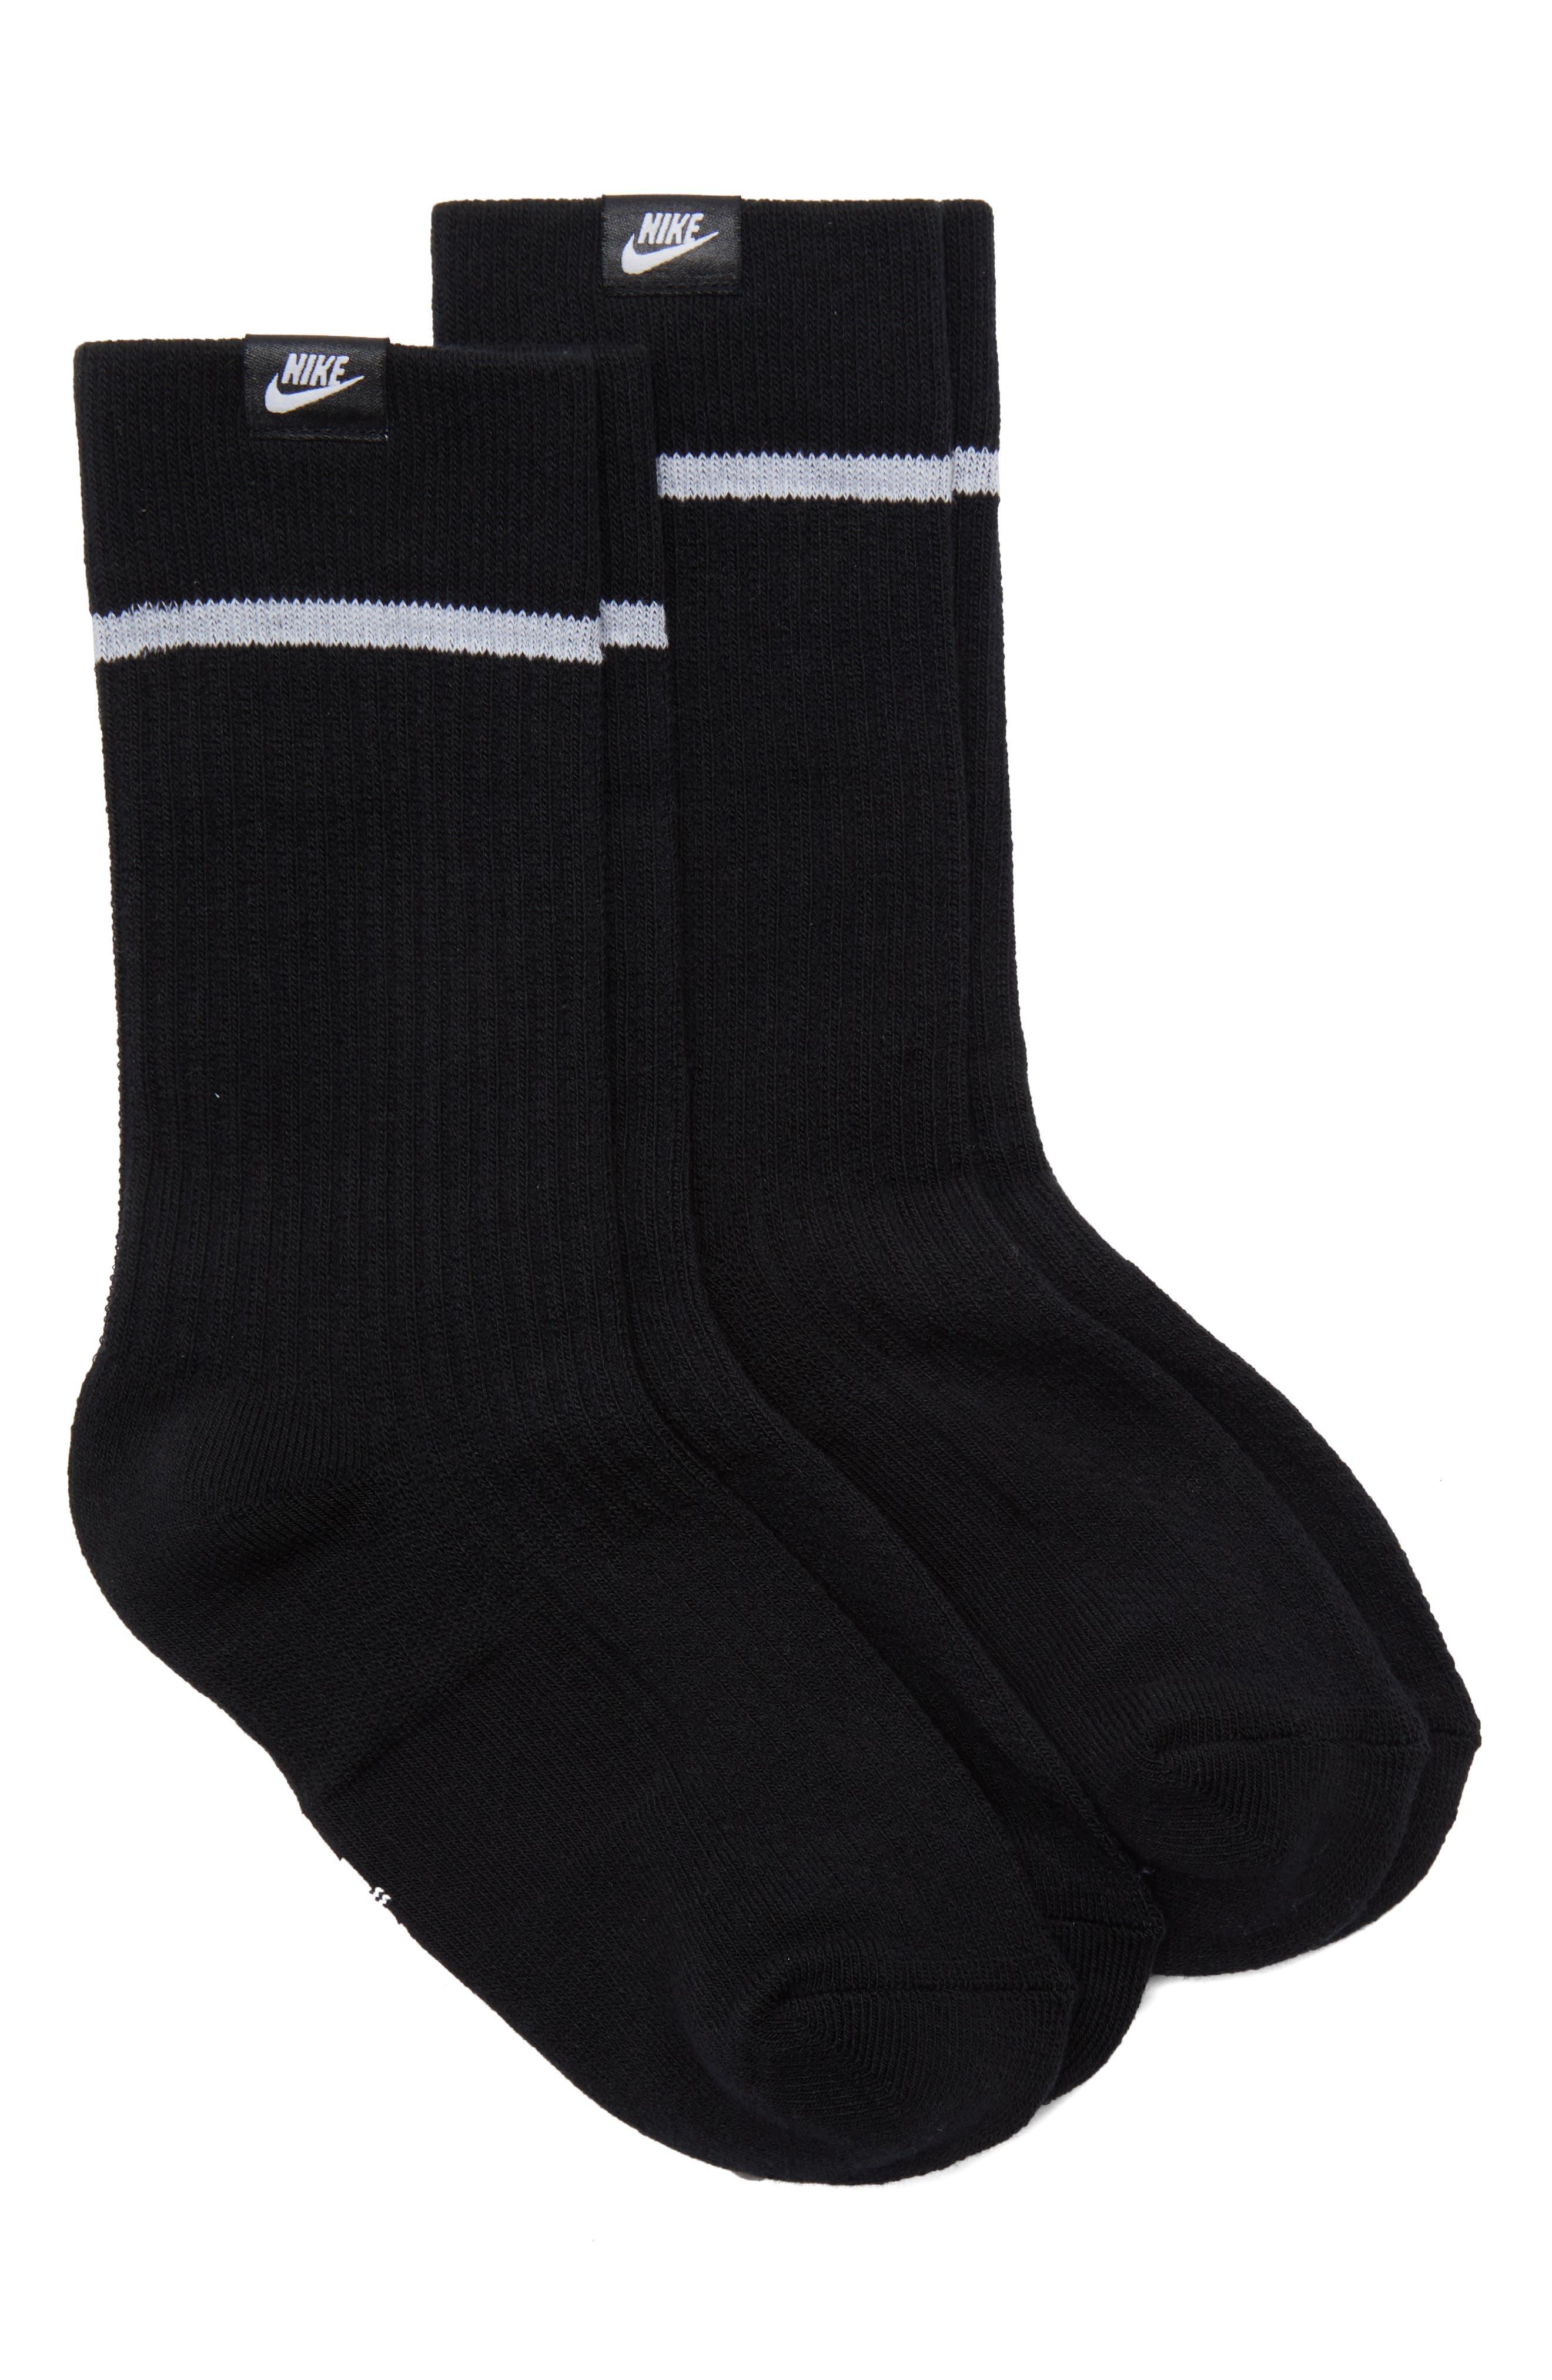 NikeLab 2-Pack Essential Crew Socks,                             Main thumbnail 1, color,                             BLACK/ WHITE